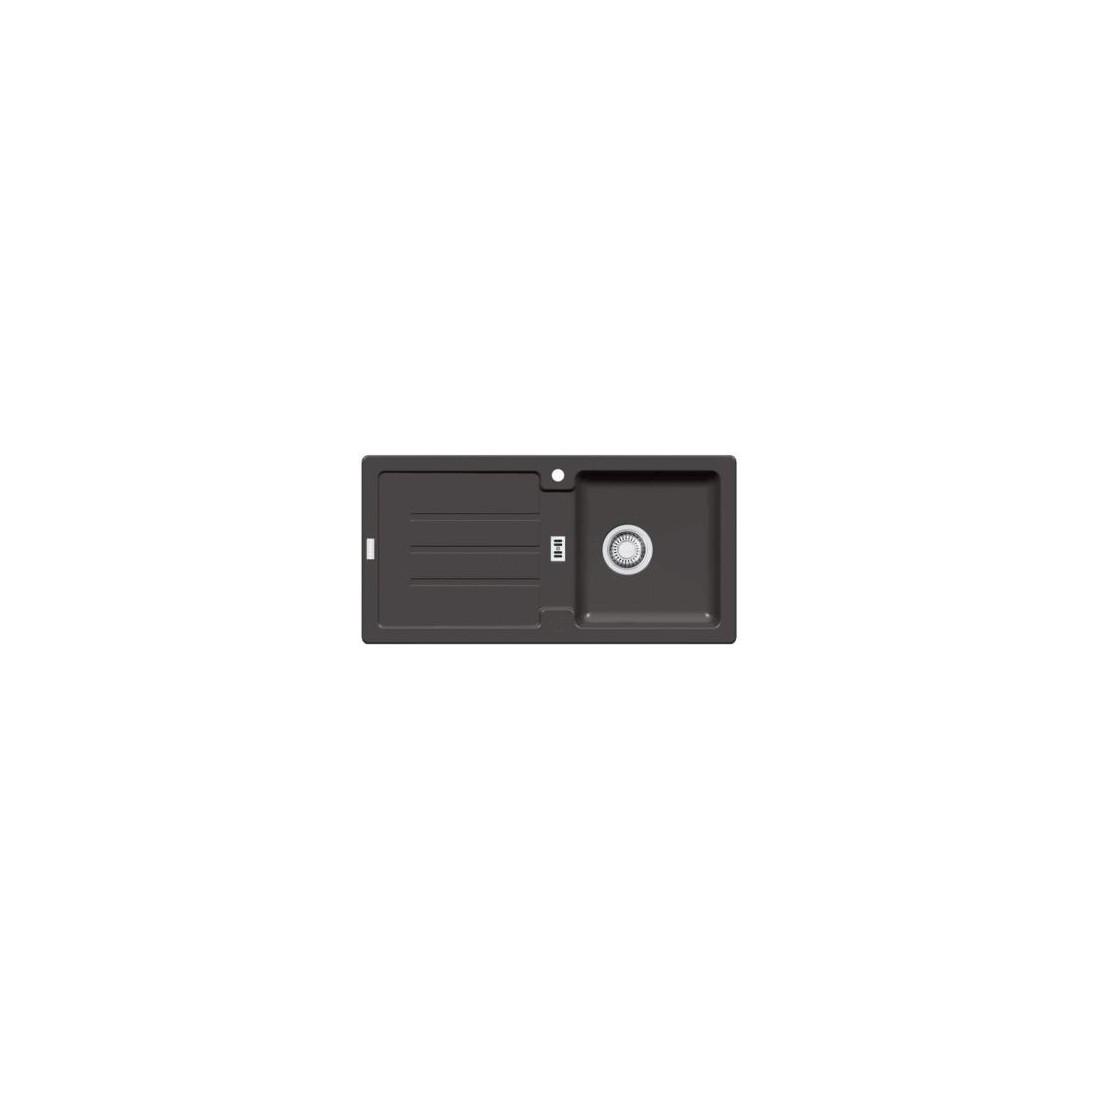 Akmens masės plautuvė Franke Strata, STG 614-86, Graphit, užkemšamas ventilis